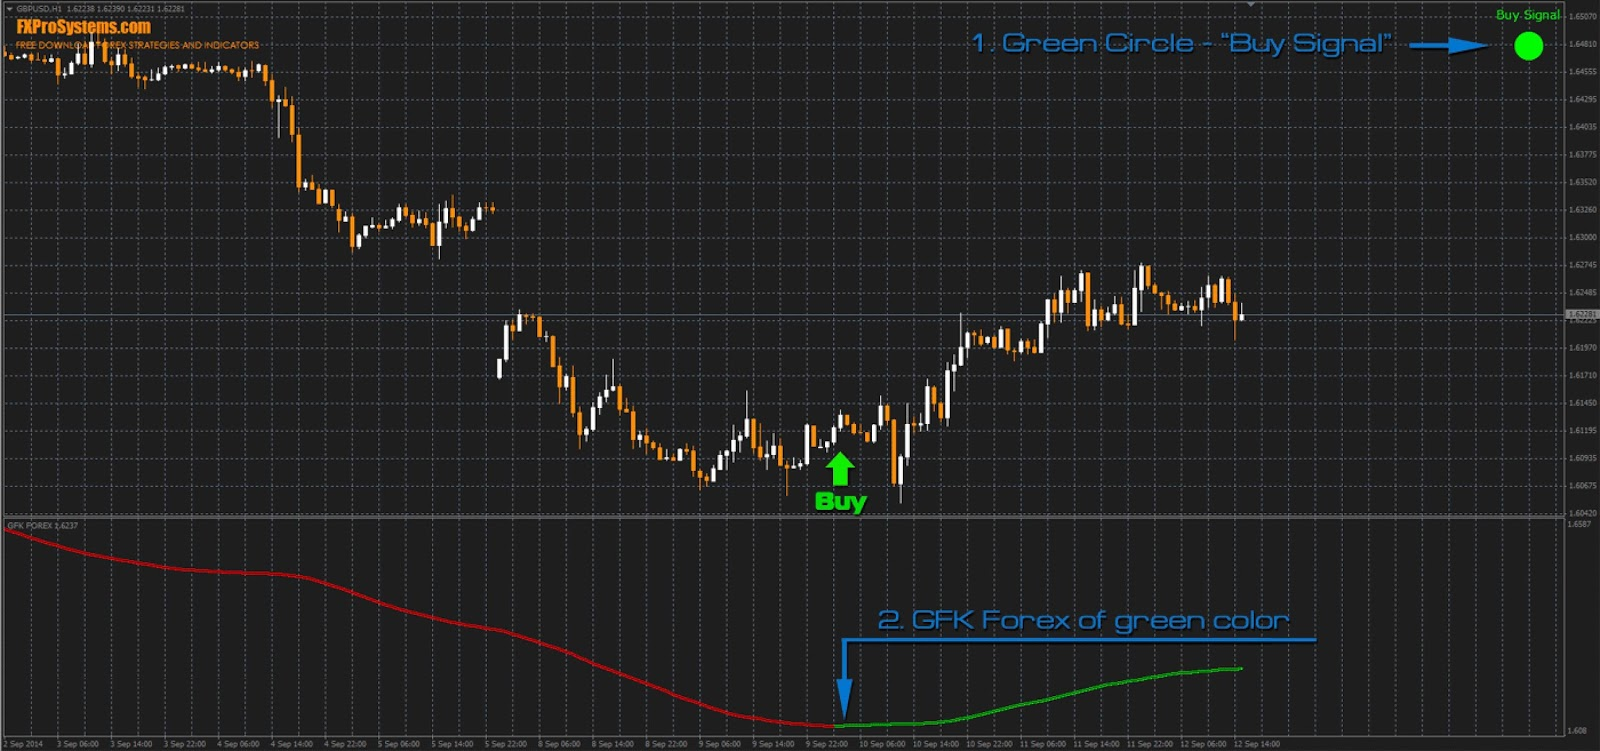 Forex market watch indicator